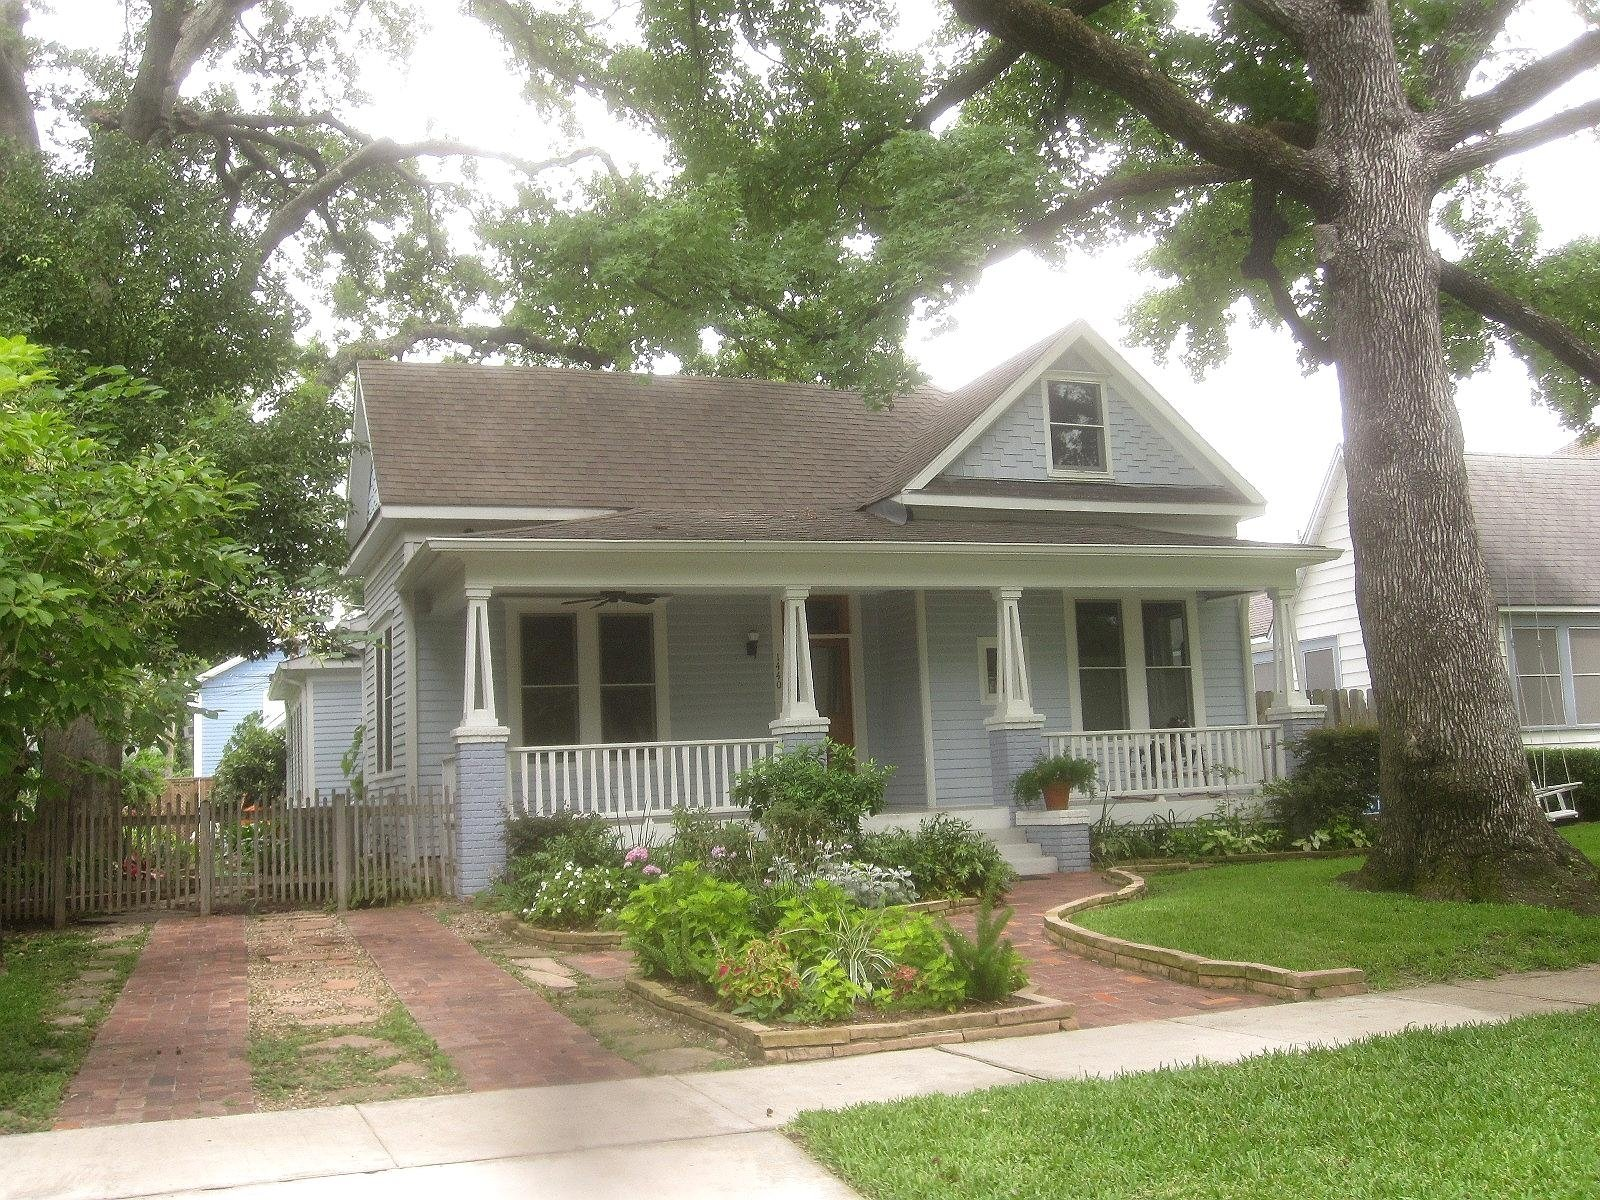 10 Fantastic Cottage Landscaping Ideas For Front Yard lovely front yard garden ideas part 2 cottage landscaping loversiq